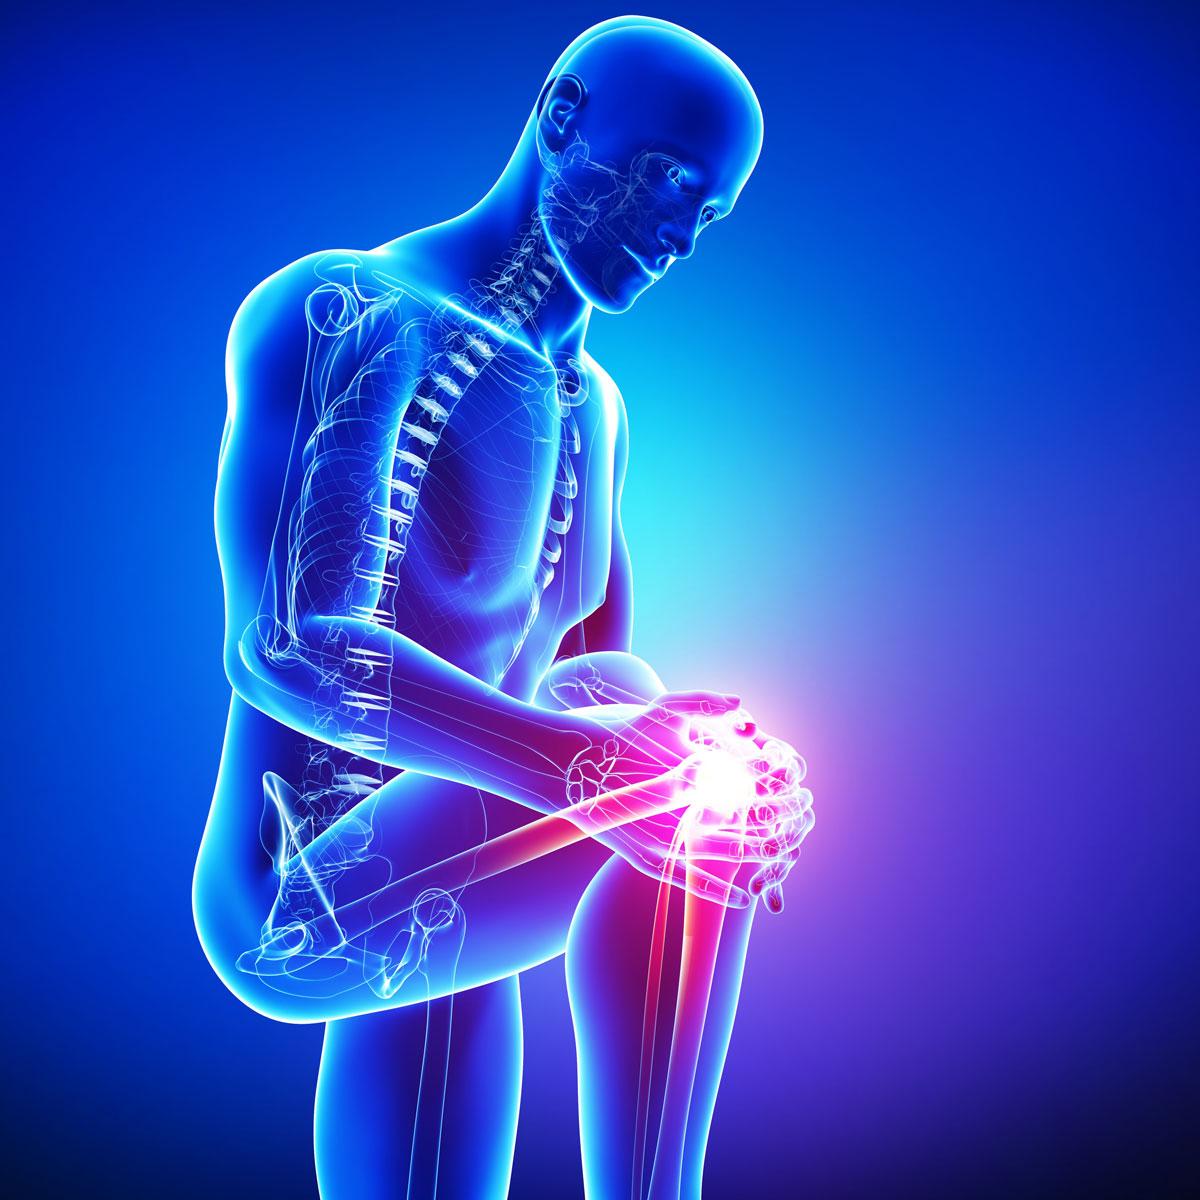 Лечение артроза коленных суставов днепропетровск фиксирующая повязка на коленный сустав фото